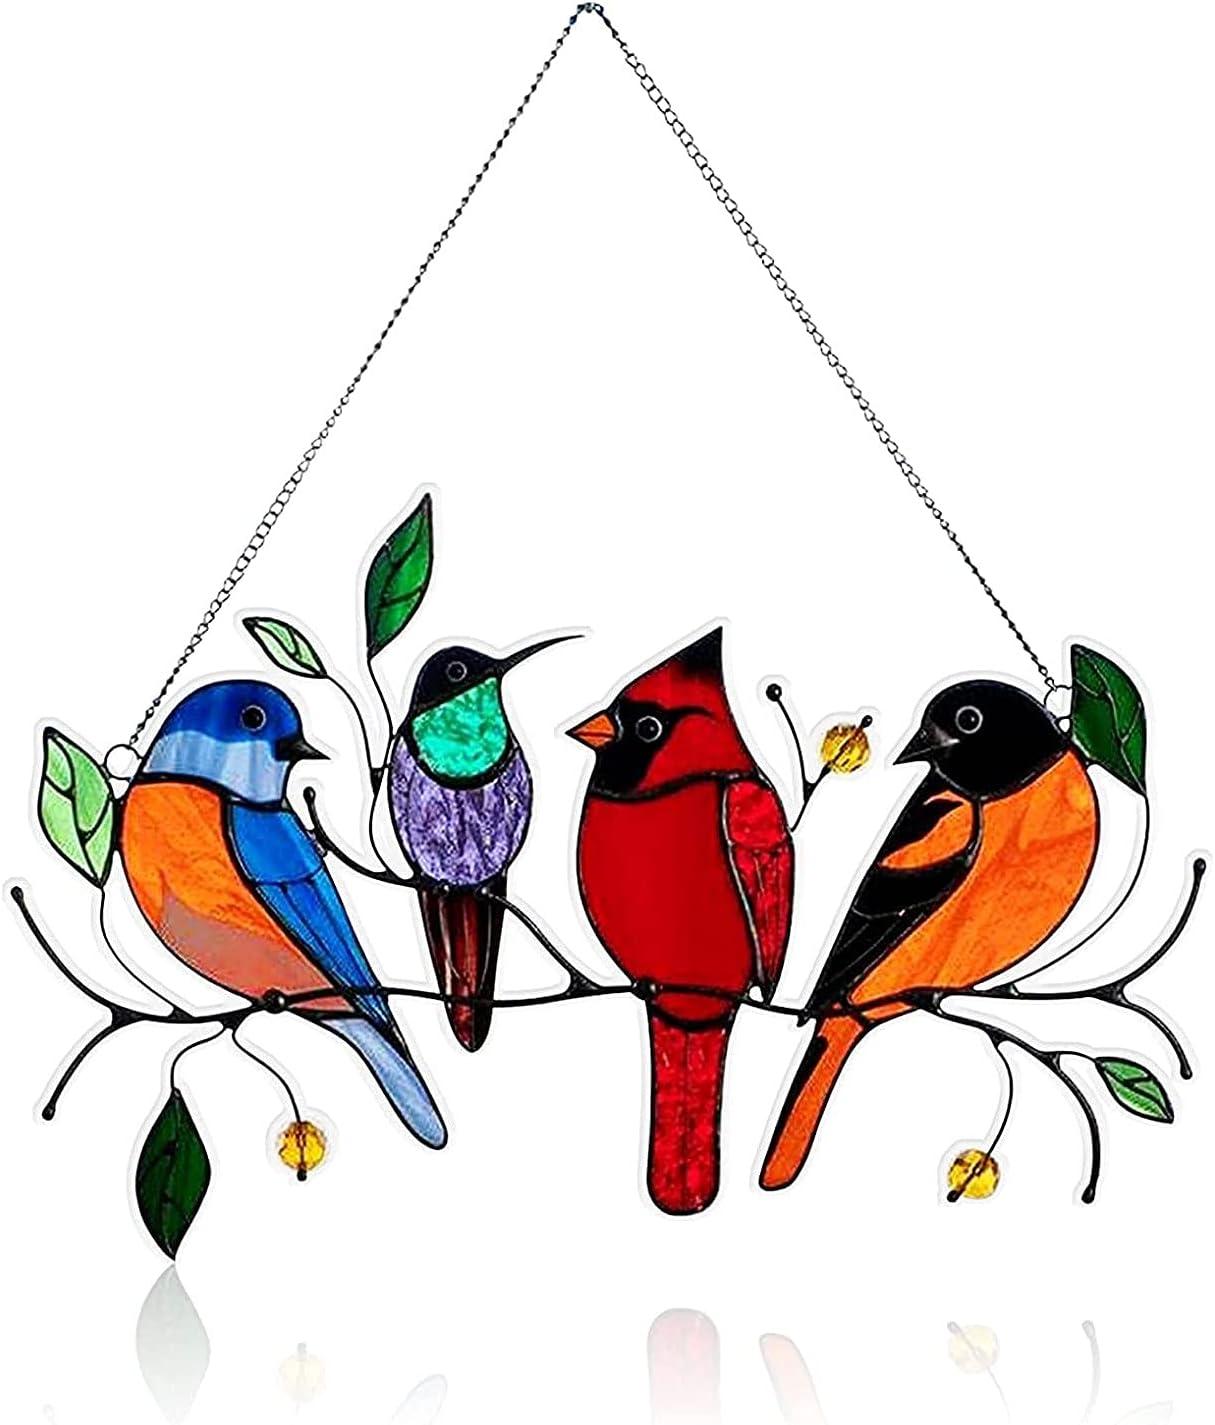 Garden Suncatcher,Multicolor Birds on a Wire High Stained Suncatcher Window Panel, Personality Birds Window Hangings Suncatchers,Bird Series Sculptures Pendant for Patio Yard (4 Bird)